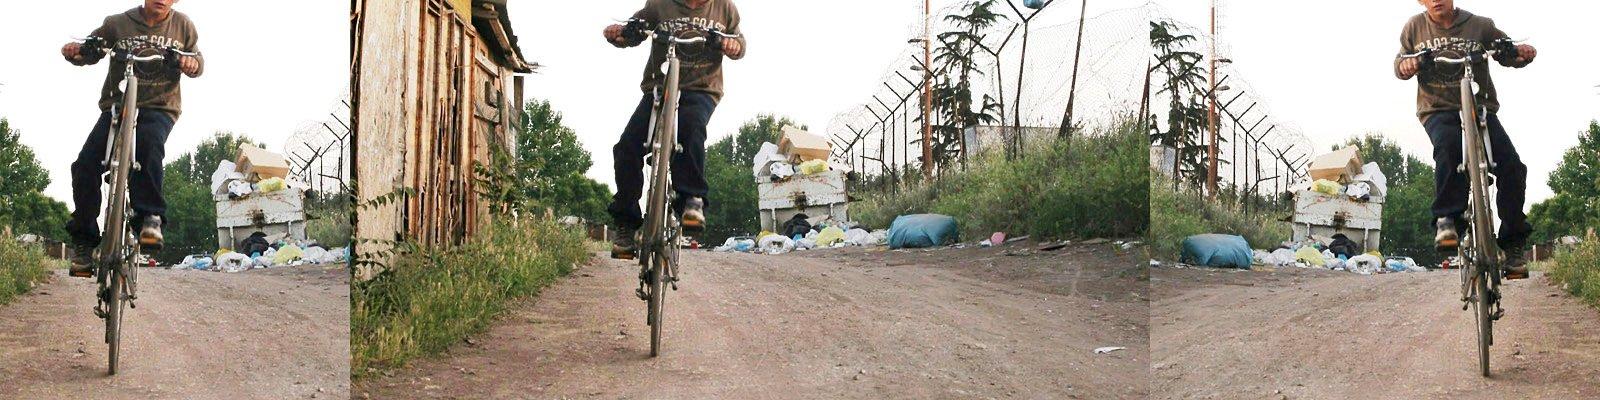 bicicletta zingara